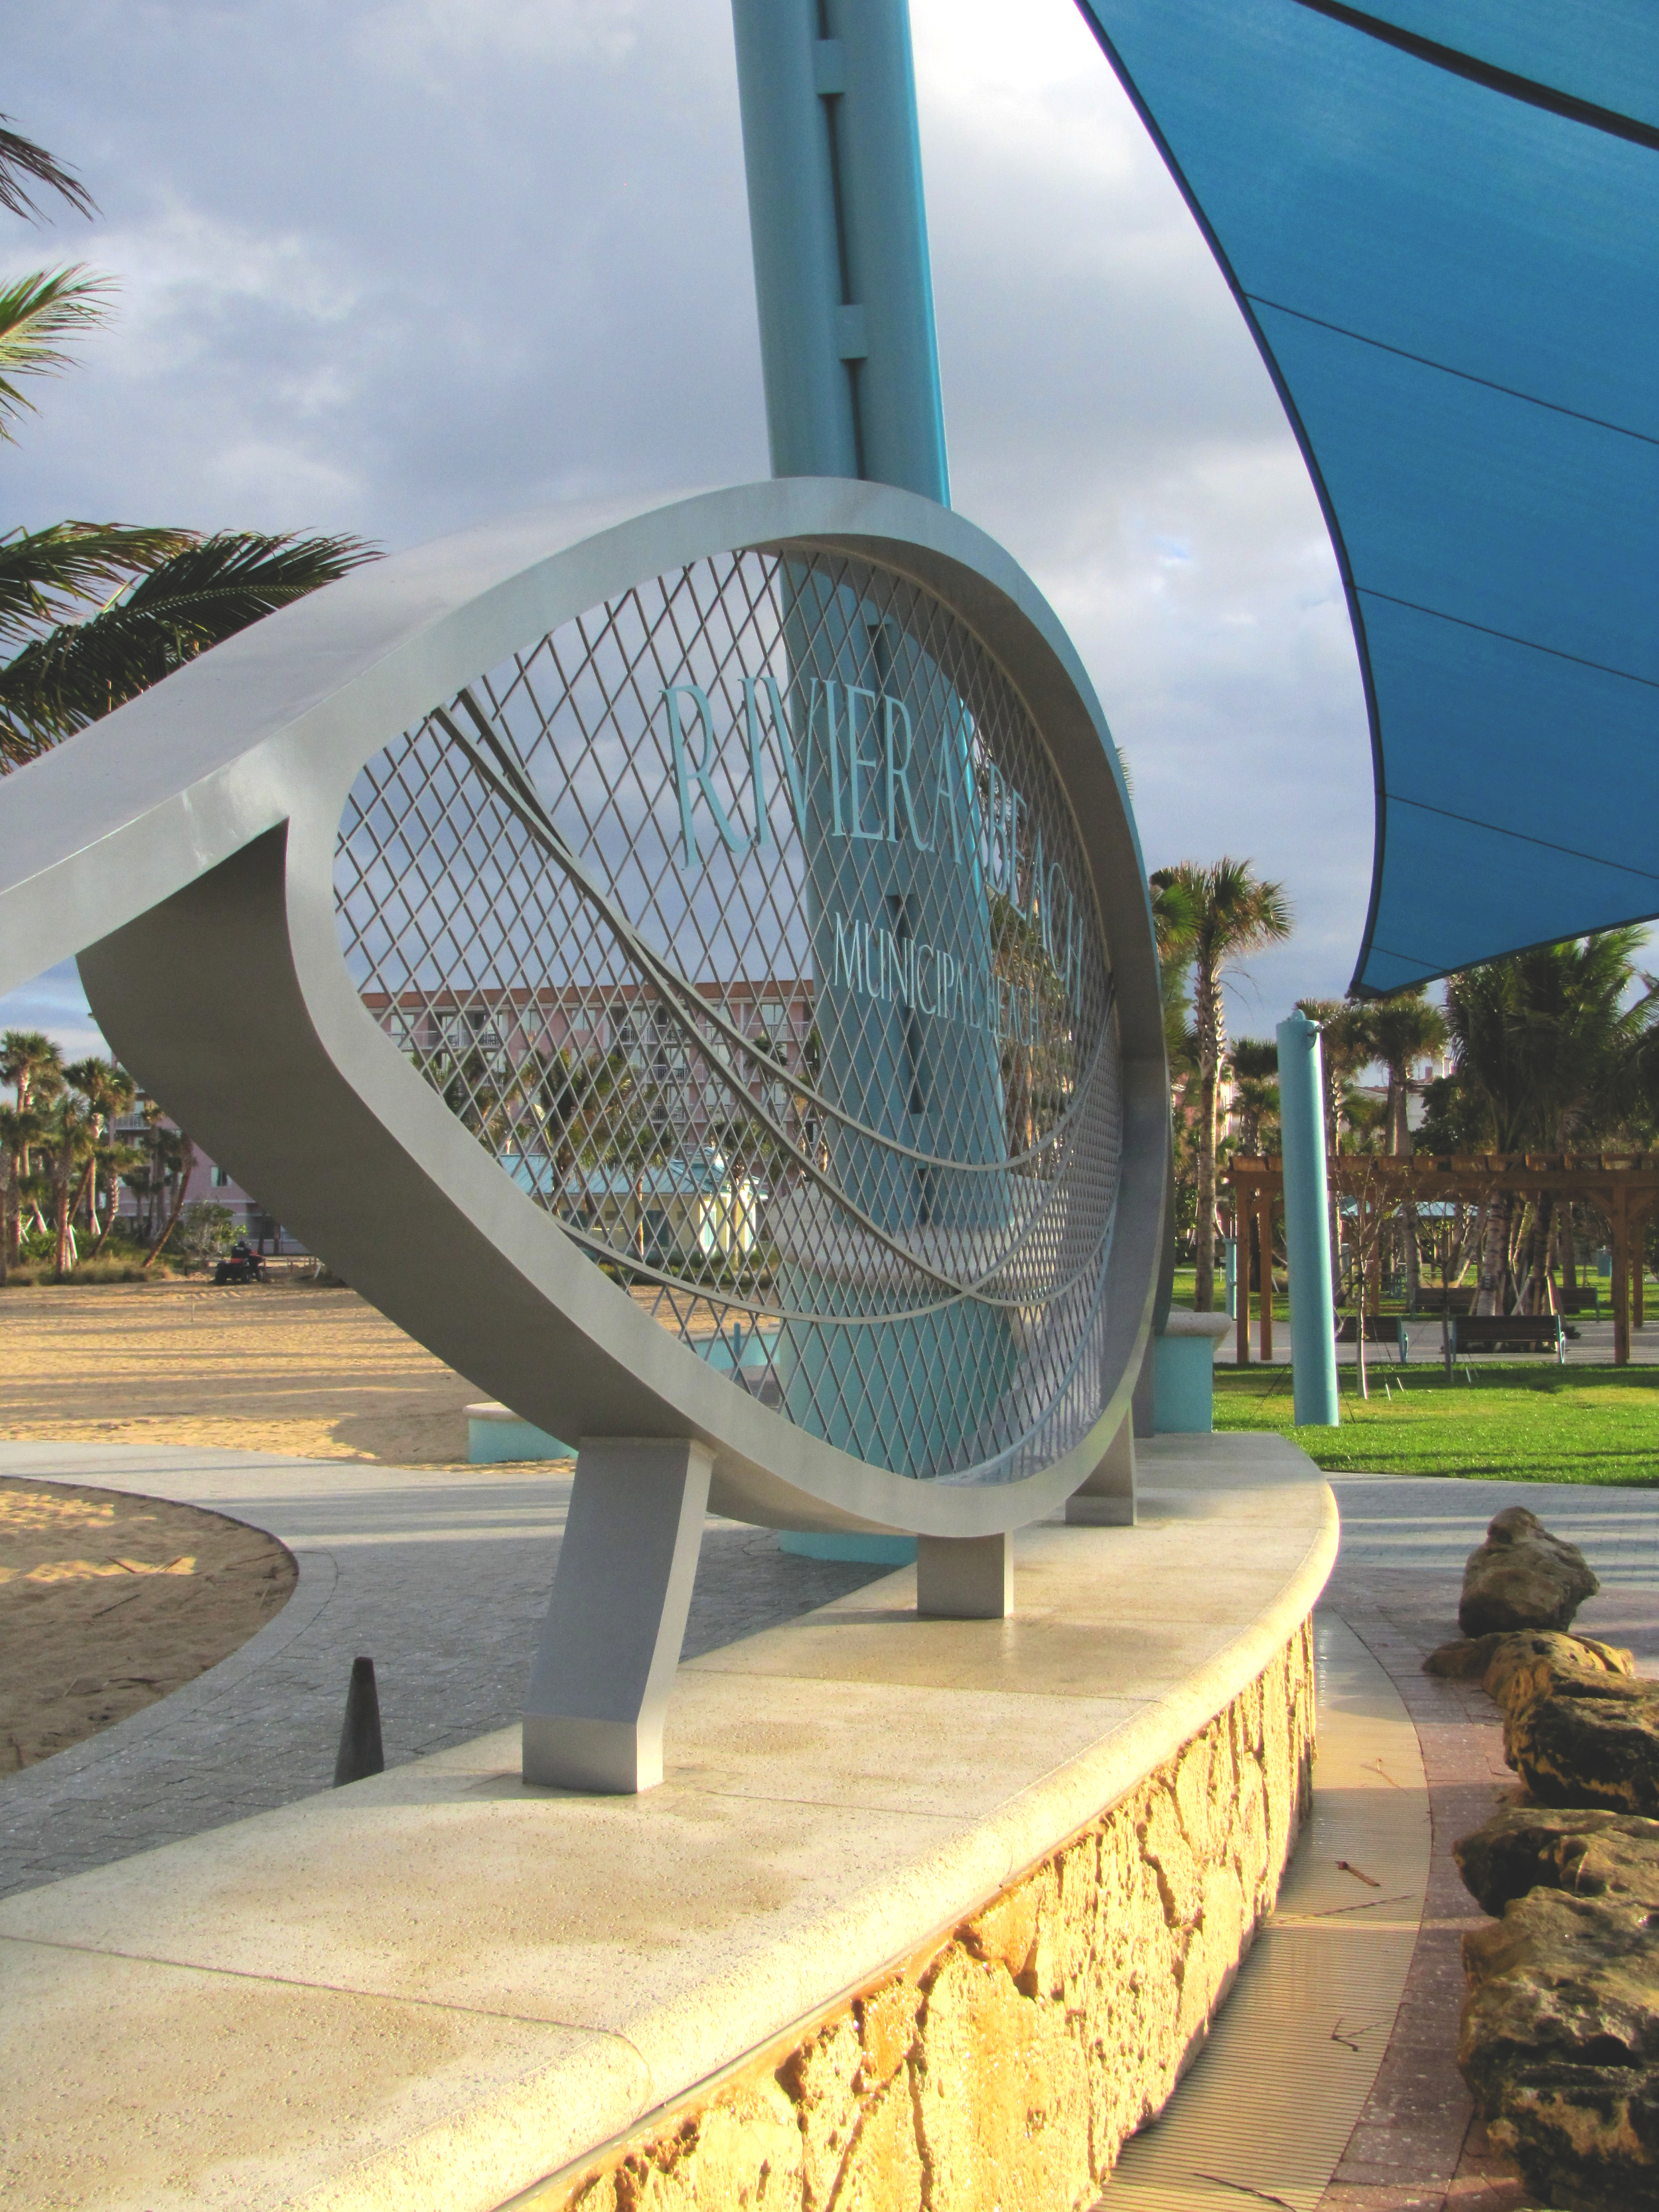 City of Riviera Beach Municipal Beach Park Ocean Mall Concrete Cap and CapRock Water feature.jpg